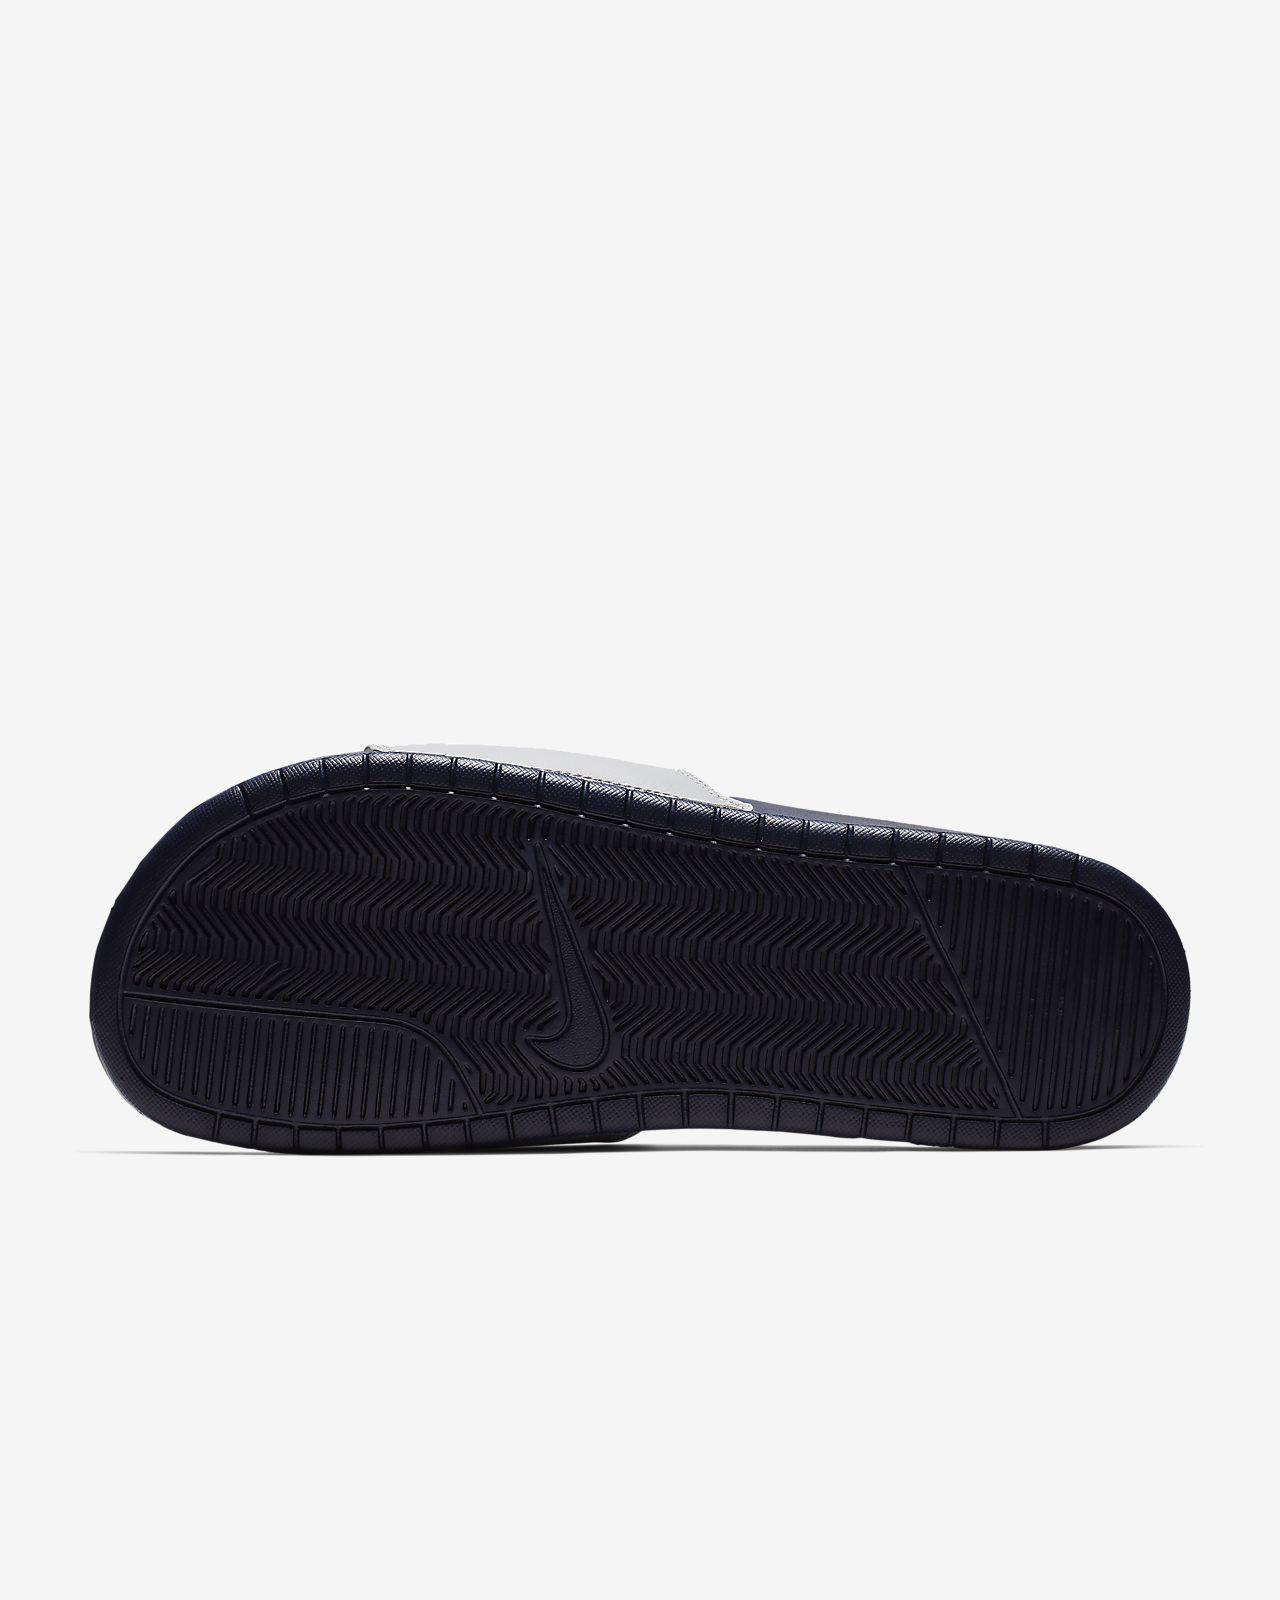 Nike Solarsoft Thong 2 Slides Flip Flops Black Sandals Slip On Shoes Womens 7